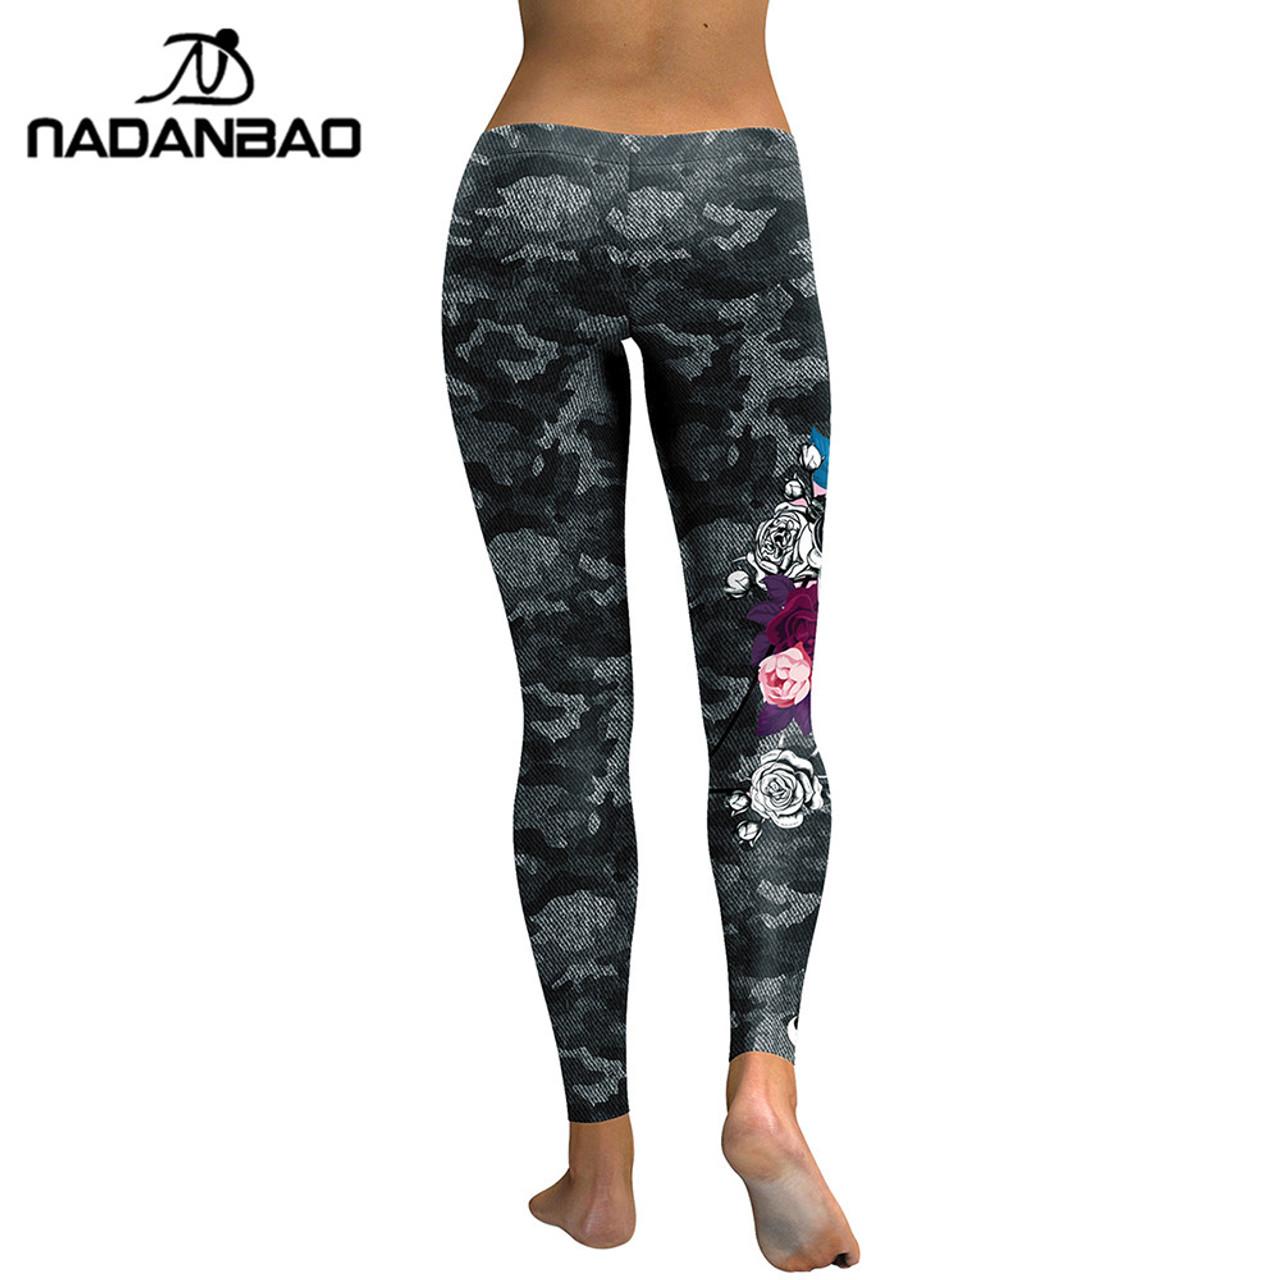 83ba2a5de4f4d1 ... NADANBAO New Arrival Leggings Women Skull Head 3D Printed Camouflage Legging  Fitness Leggins Slim Elastic Trousers ...